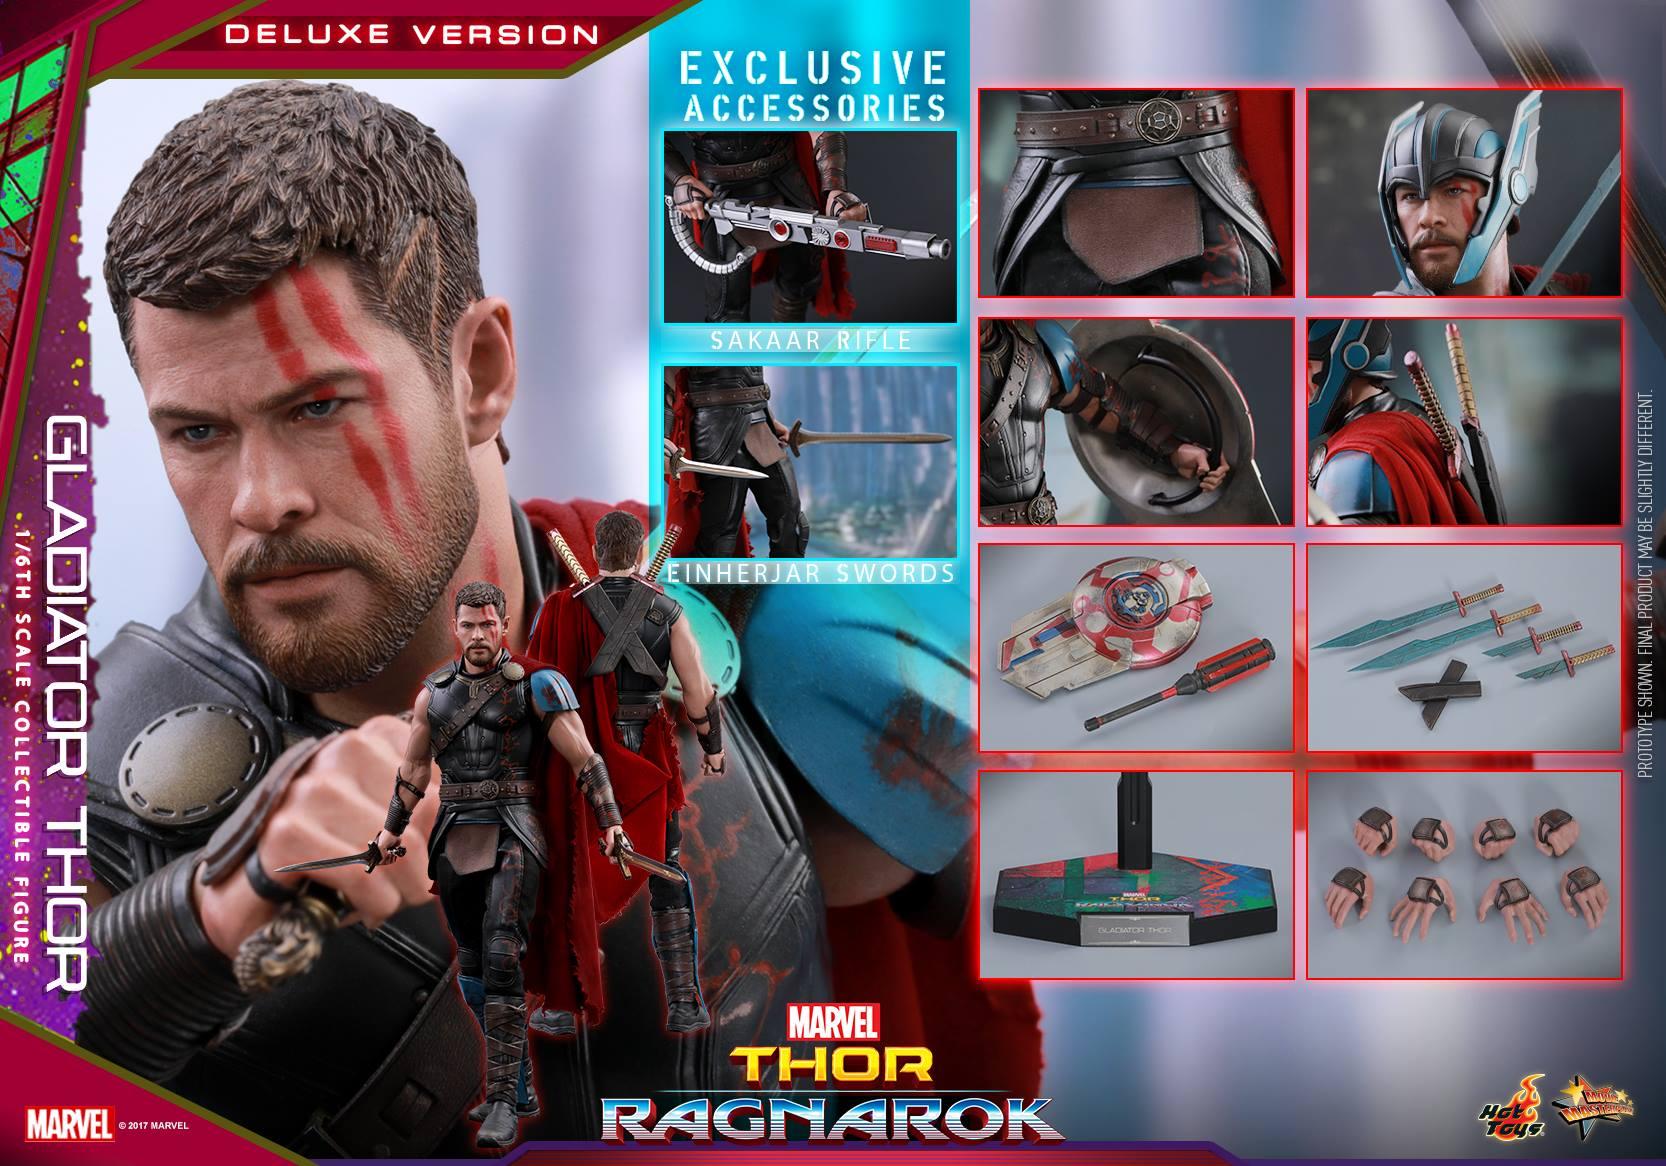 ht-gladiator-thor09